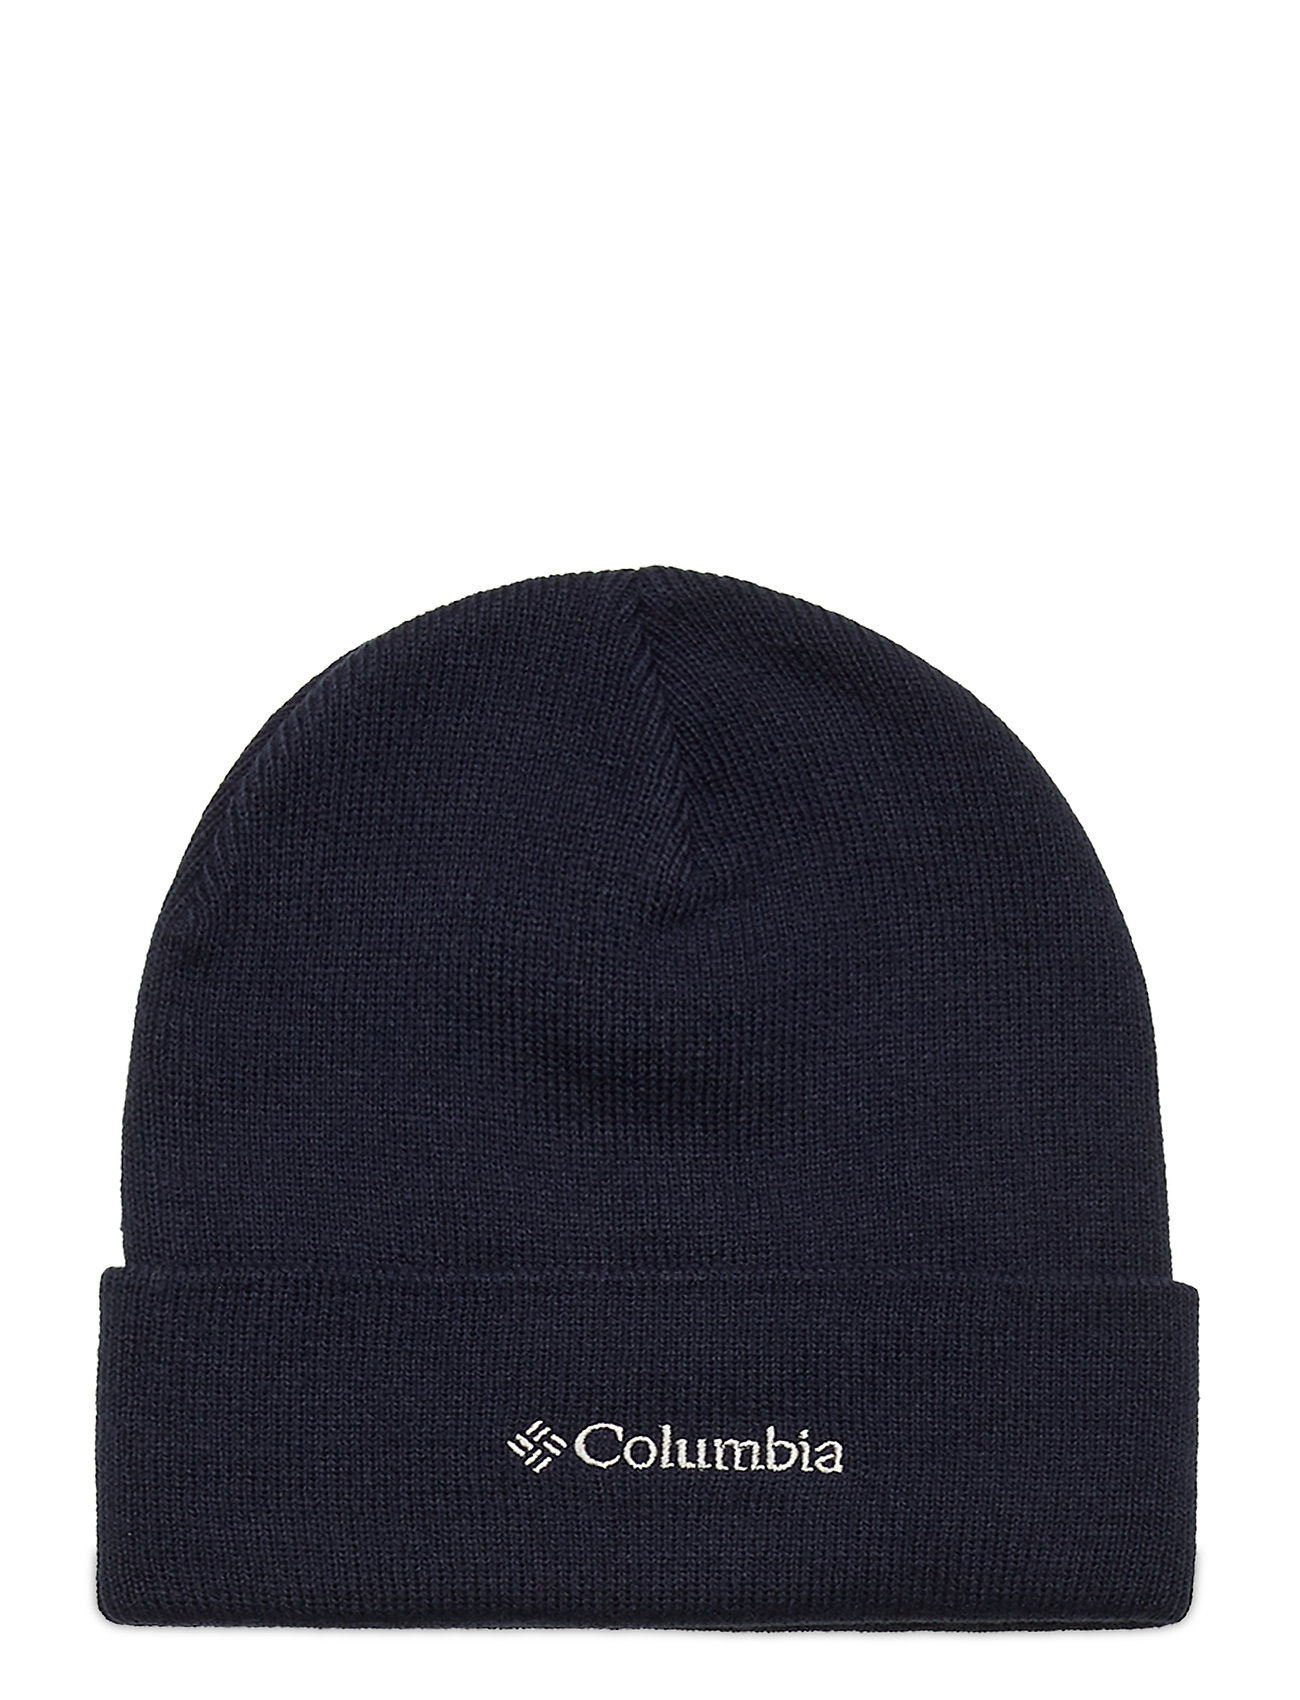 Image of City Trek™ Heavyweight Beanie Accessories Headwear Blå Columbia (3536350431)